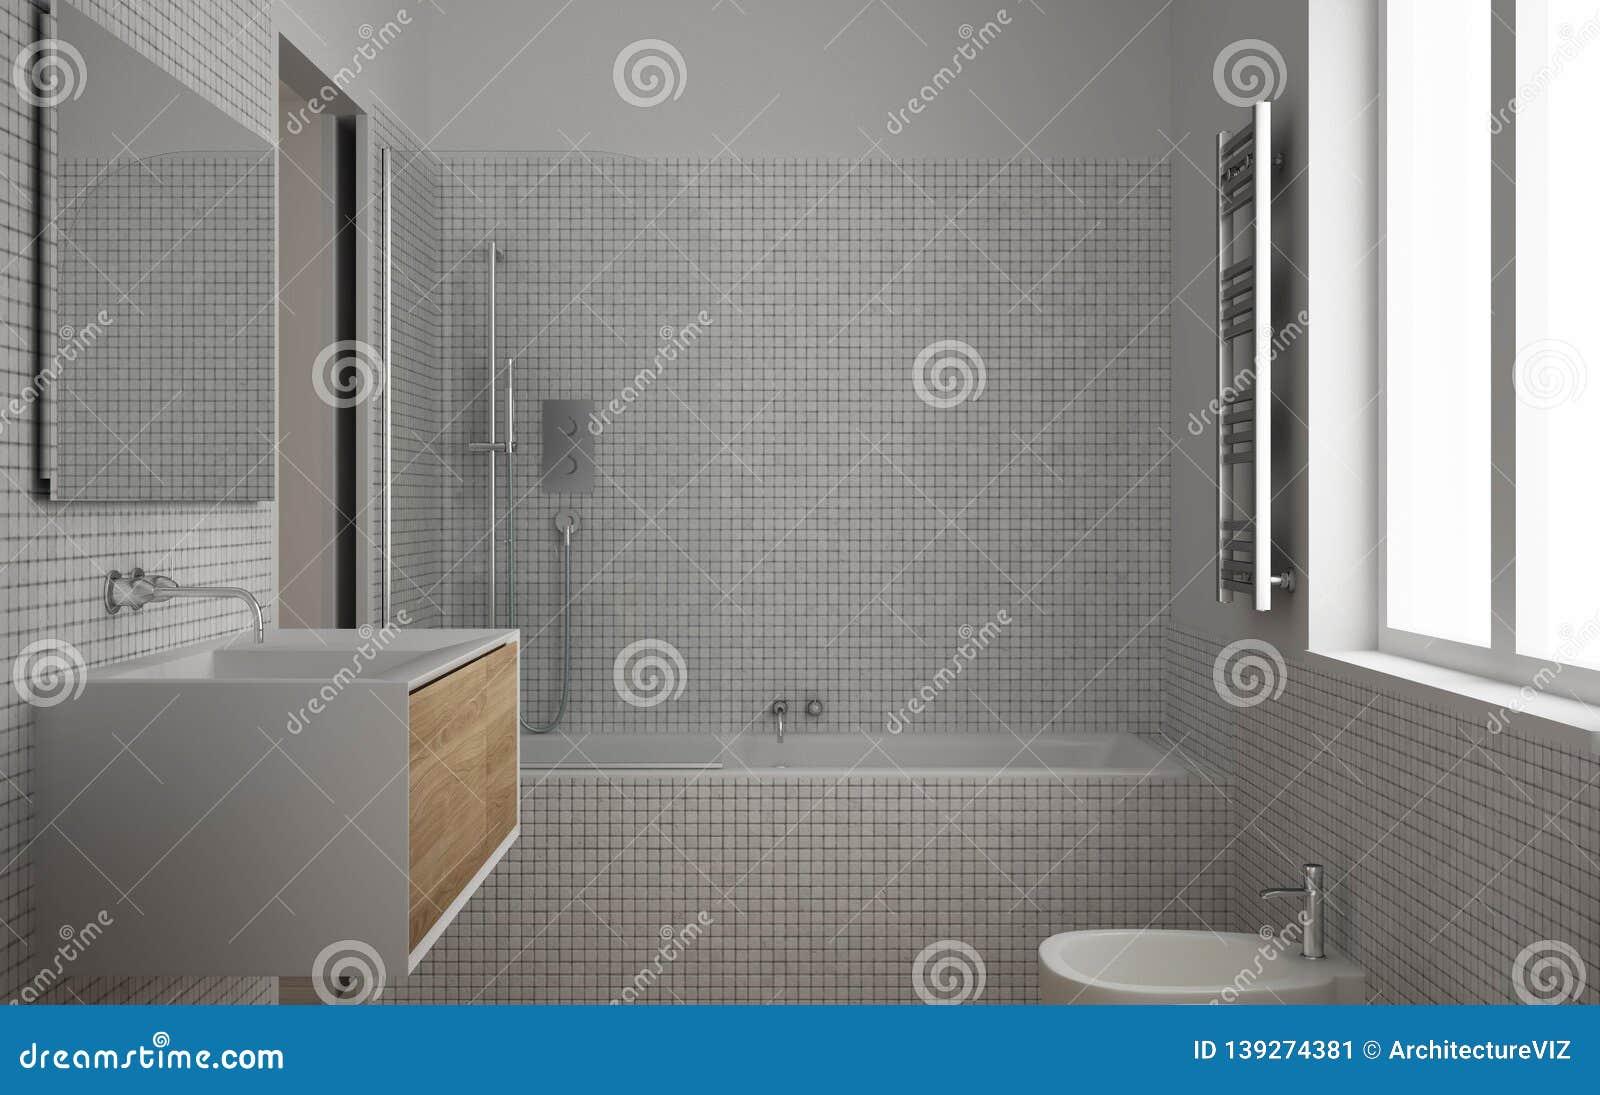 Modern Minimalist Bathroom With Parquet Oak Wood Floor And White